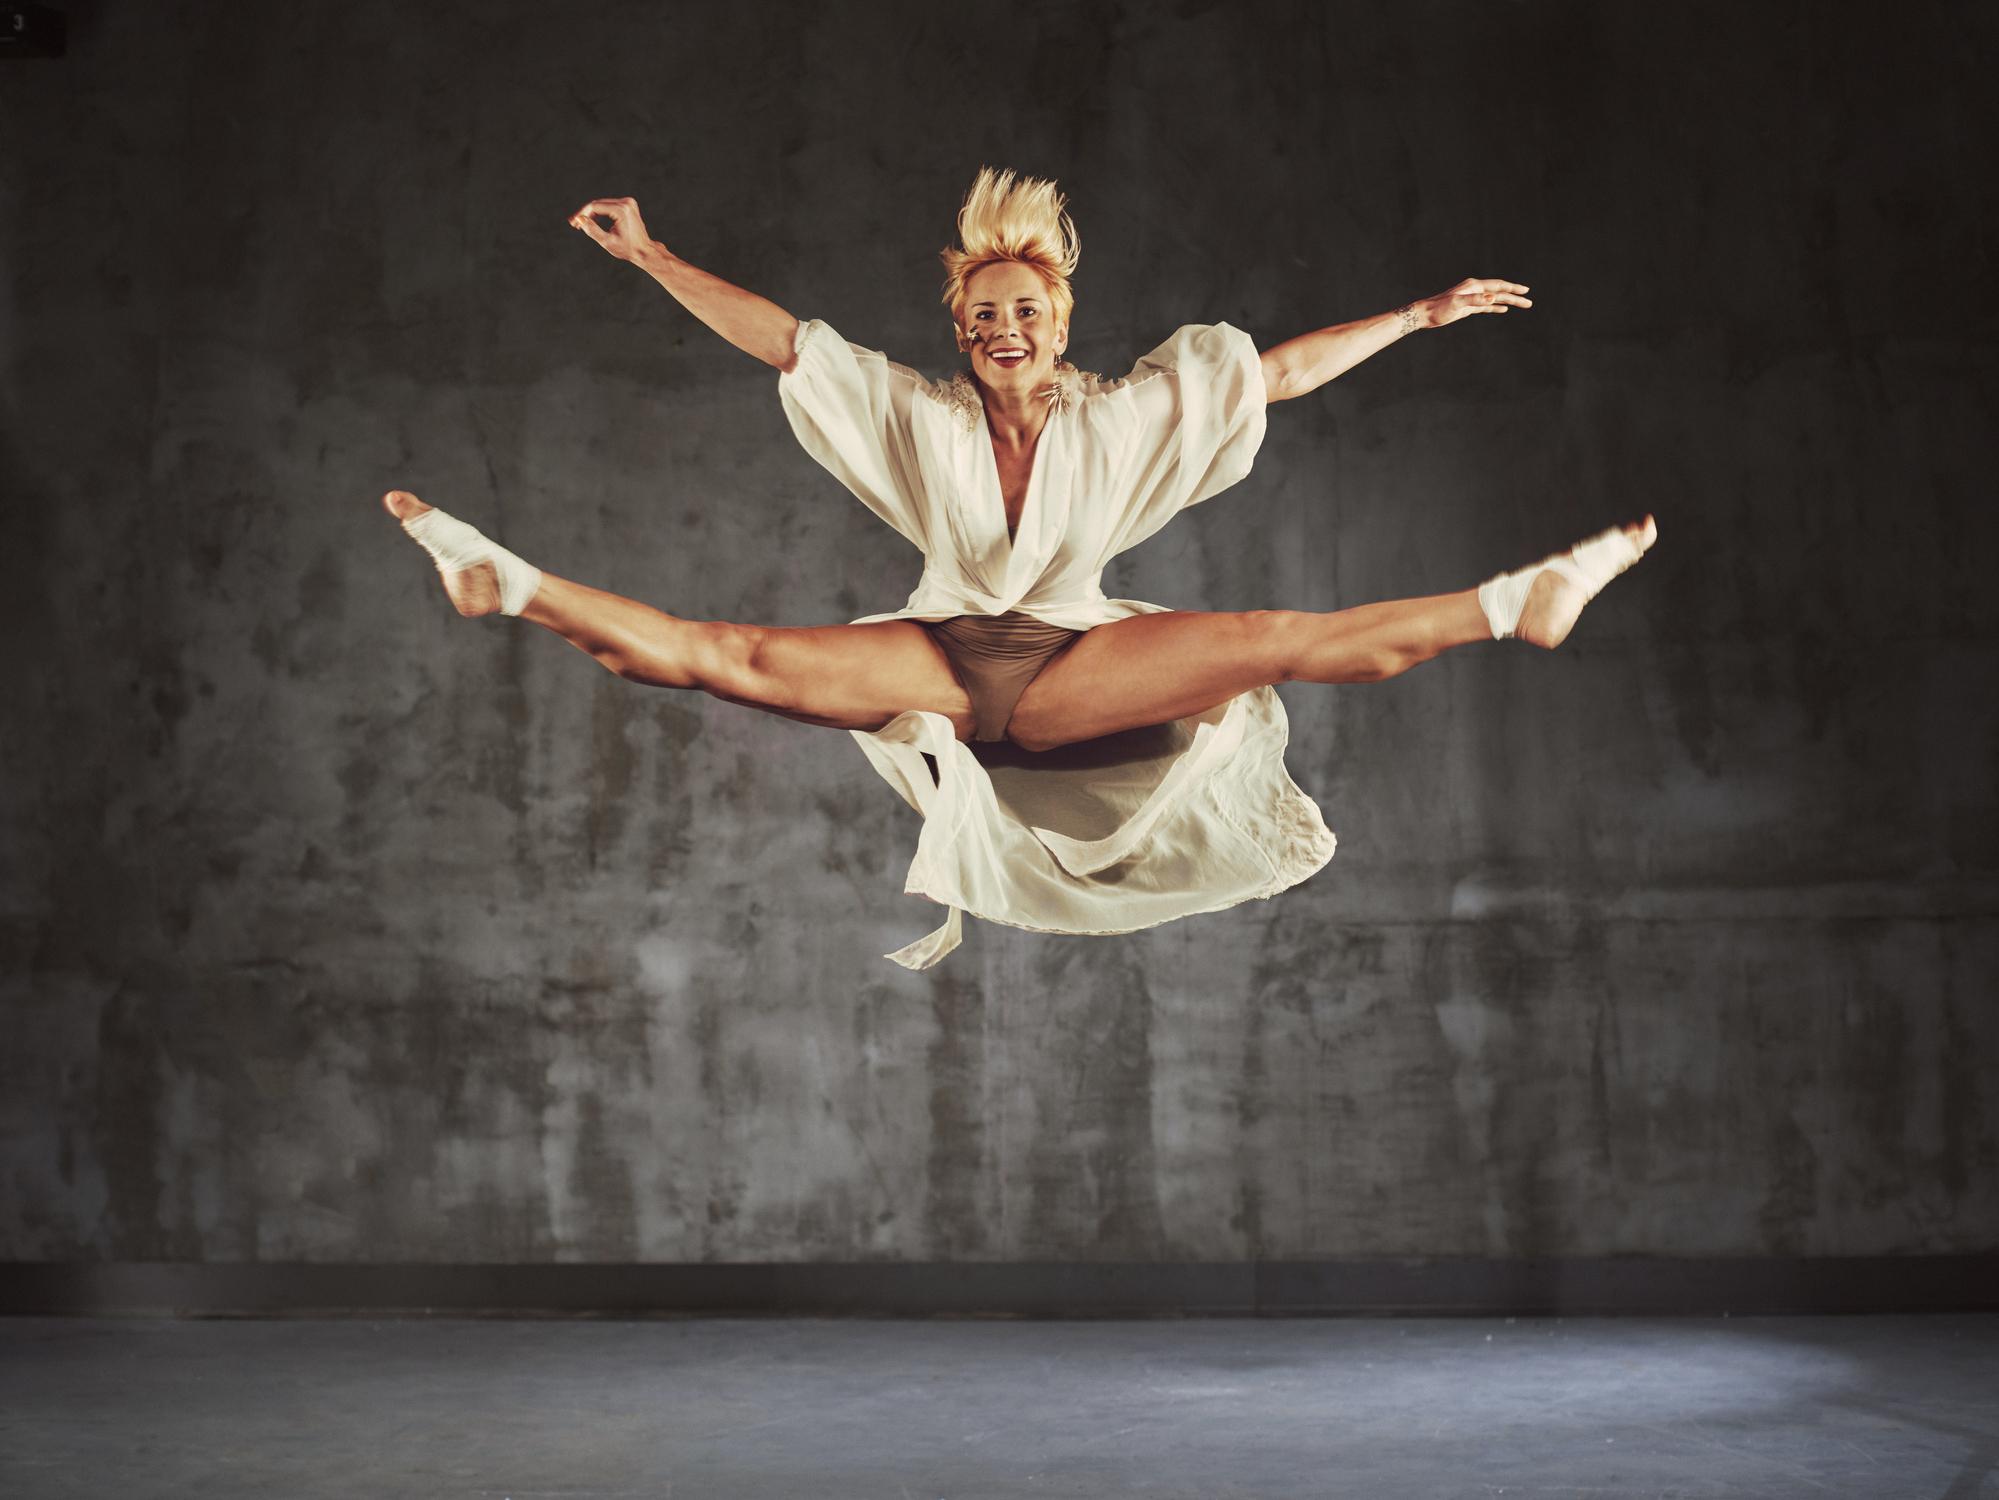 Ballet Leaps